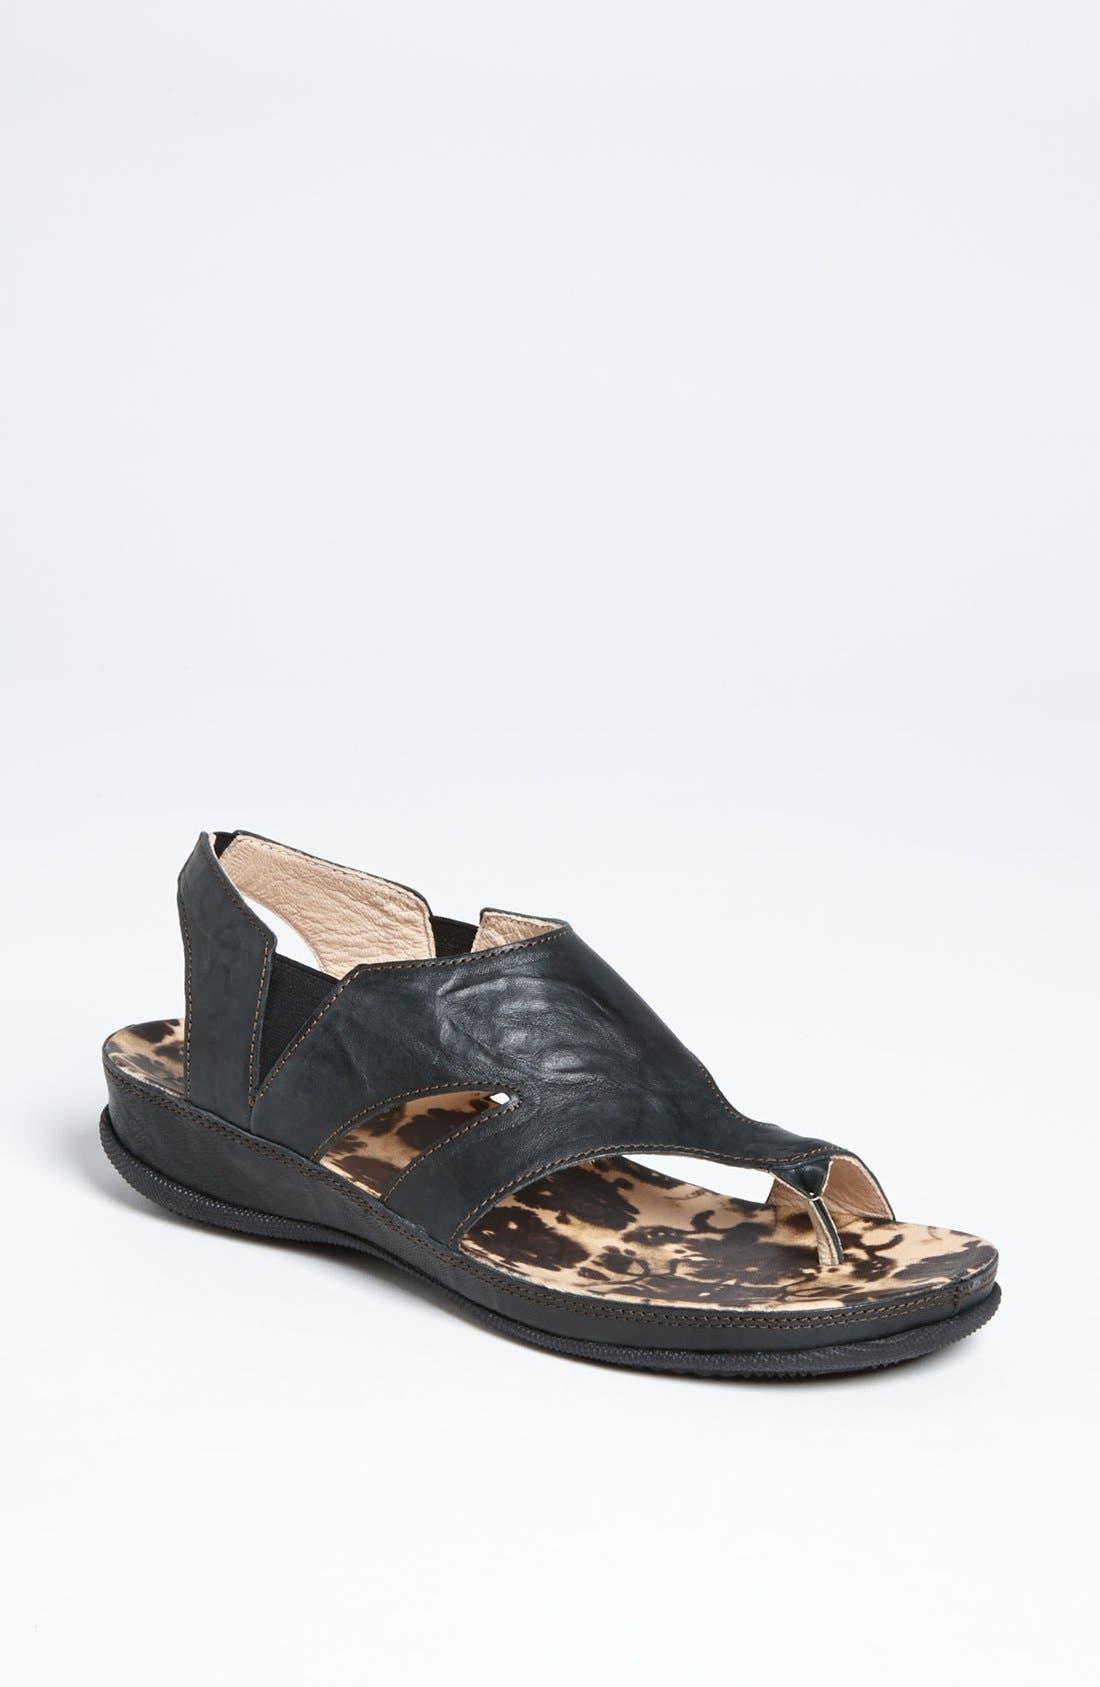 Alternate Image 1 Selected - Think! 'Zenzi' Sandal